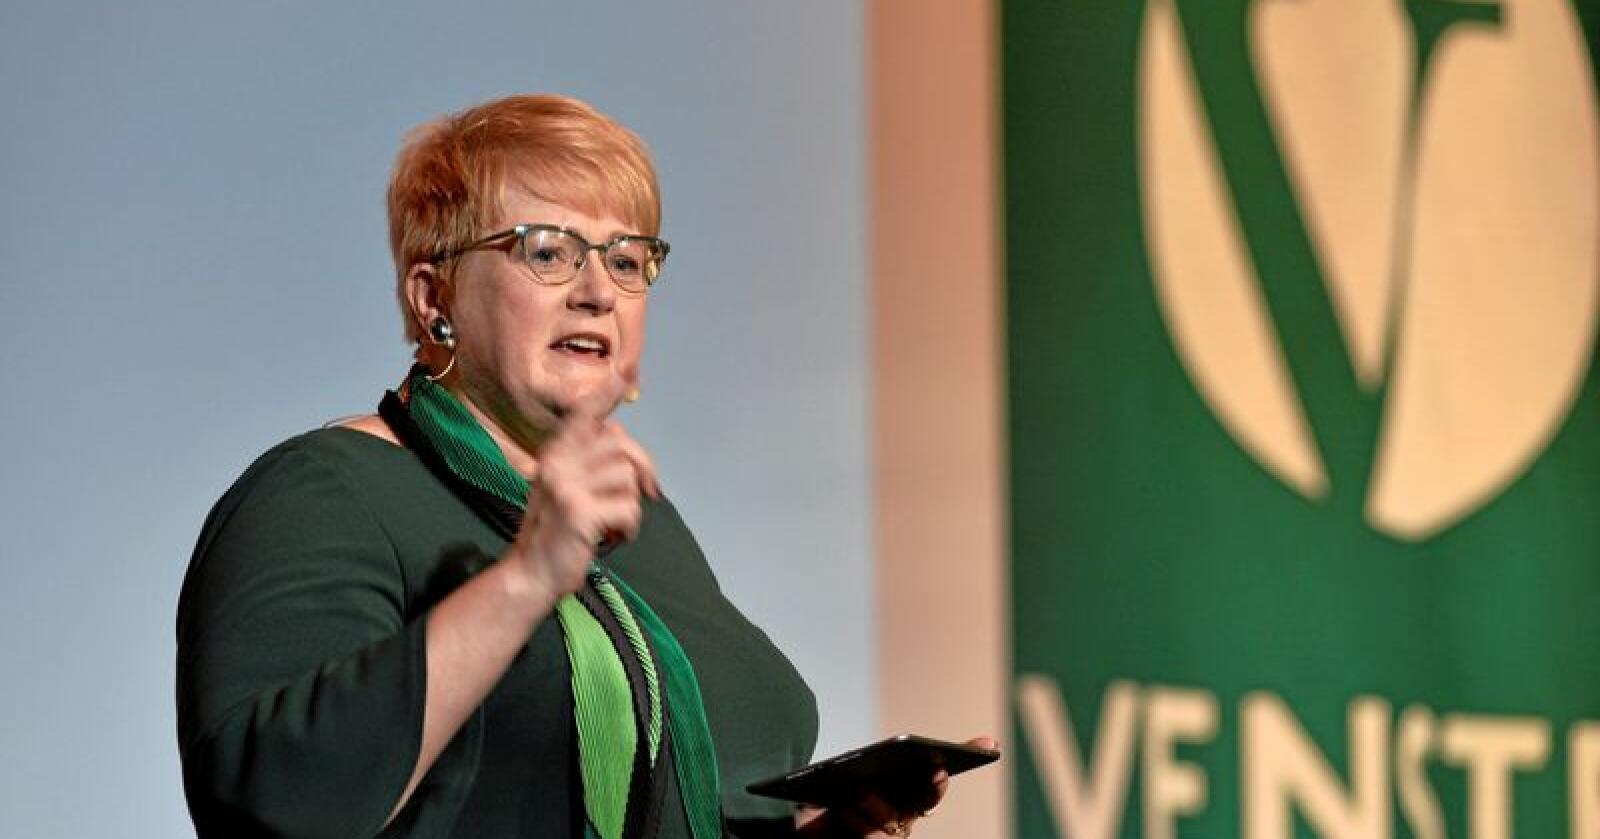 Trine Skei Grande under Venstres landsmøte 2019. Foto: Ned Alley / NTB scanpix